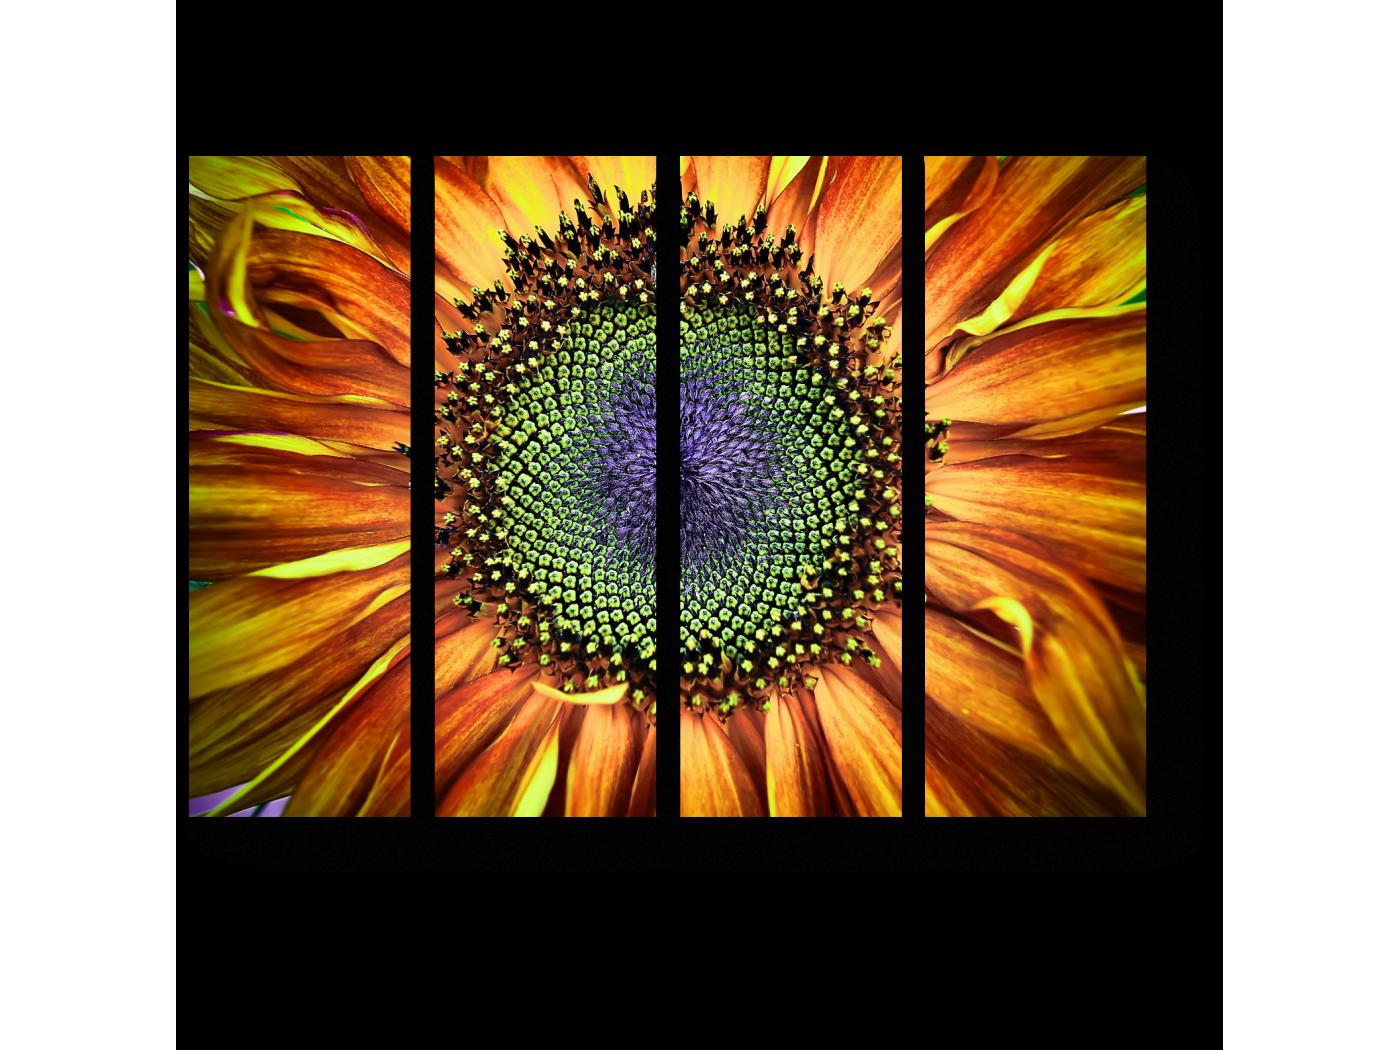 Модульная картина Внутри цветка солнца (60x45) фото